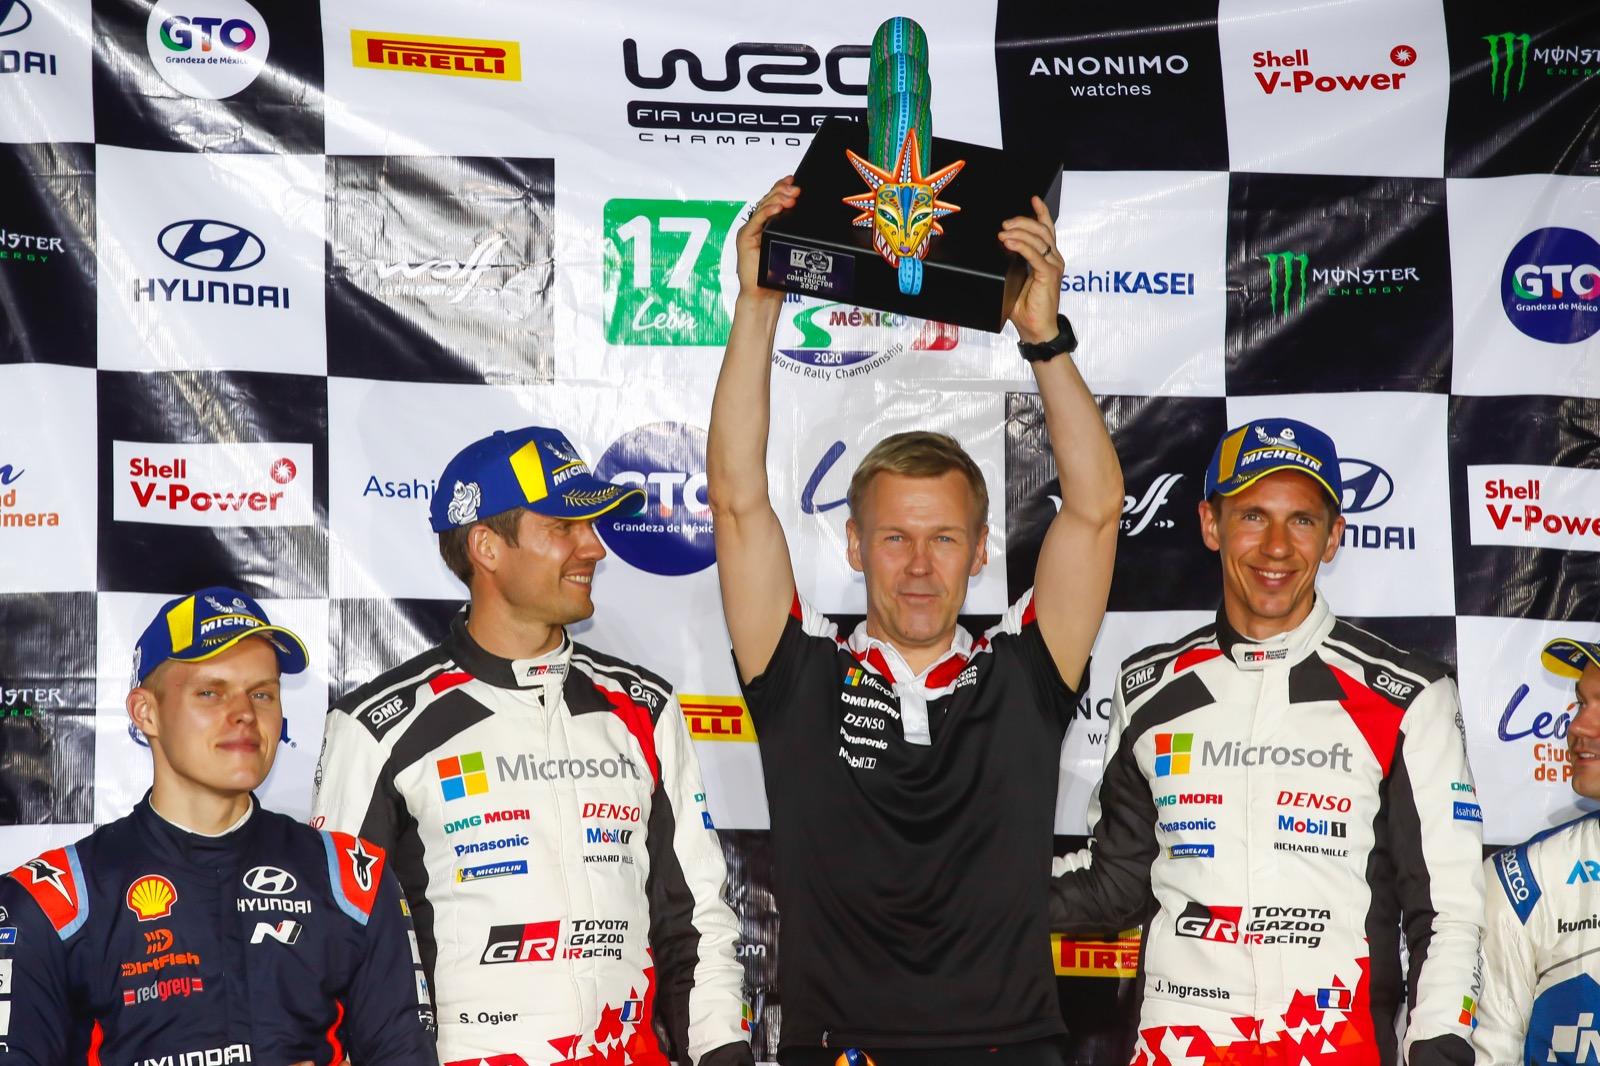 WRC: 17º Rallye Guanajuato Corona - México [12-15 Marzo] - Página 7 ETH5DX5XgAE0mOv?format=jpg&name=large